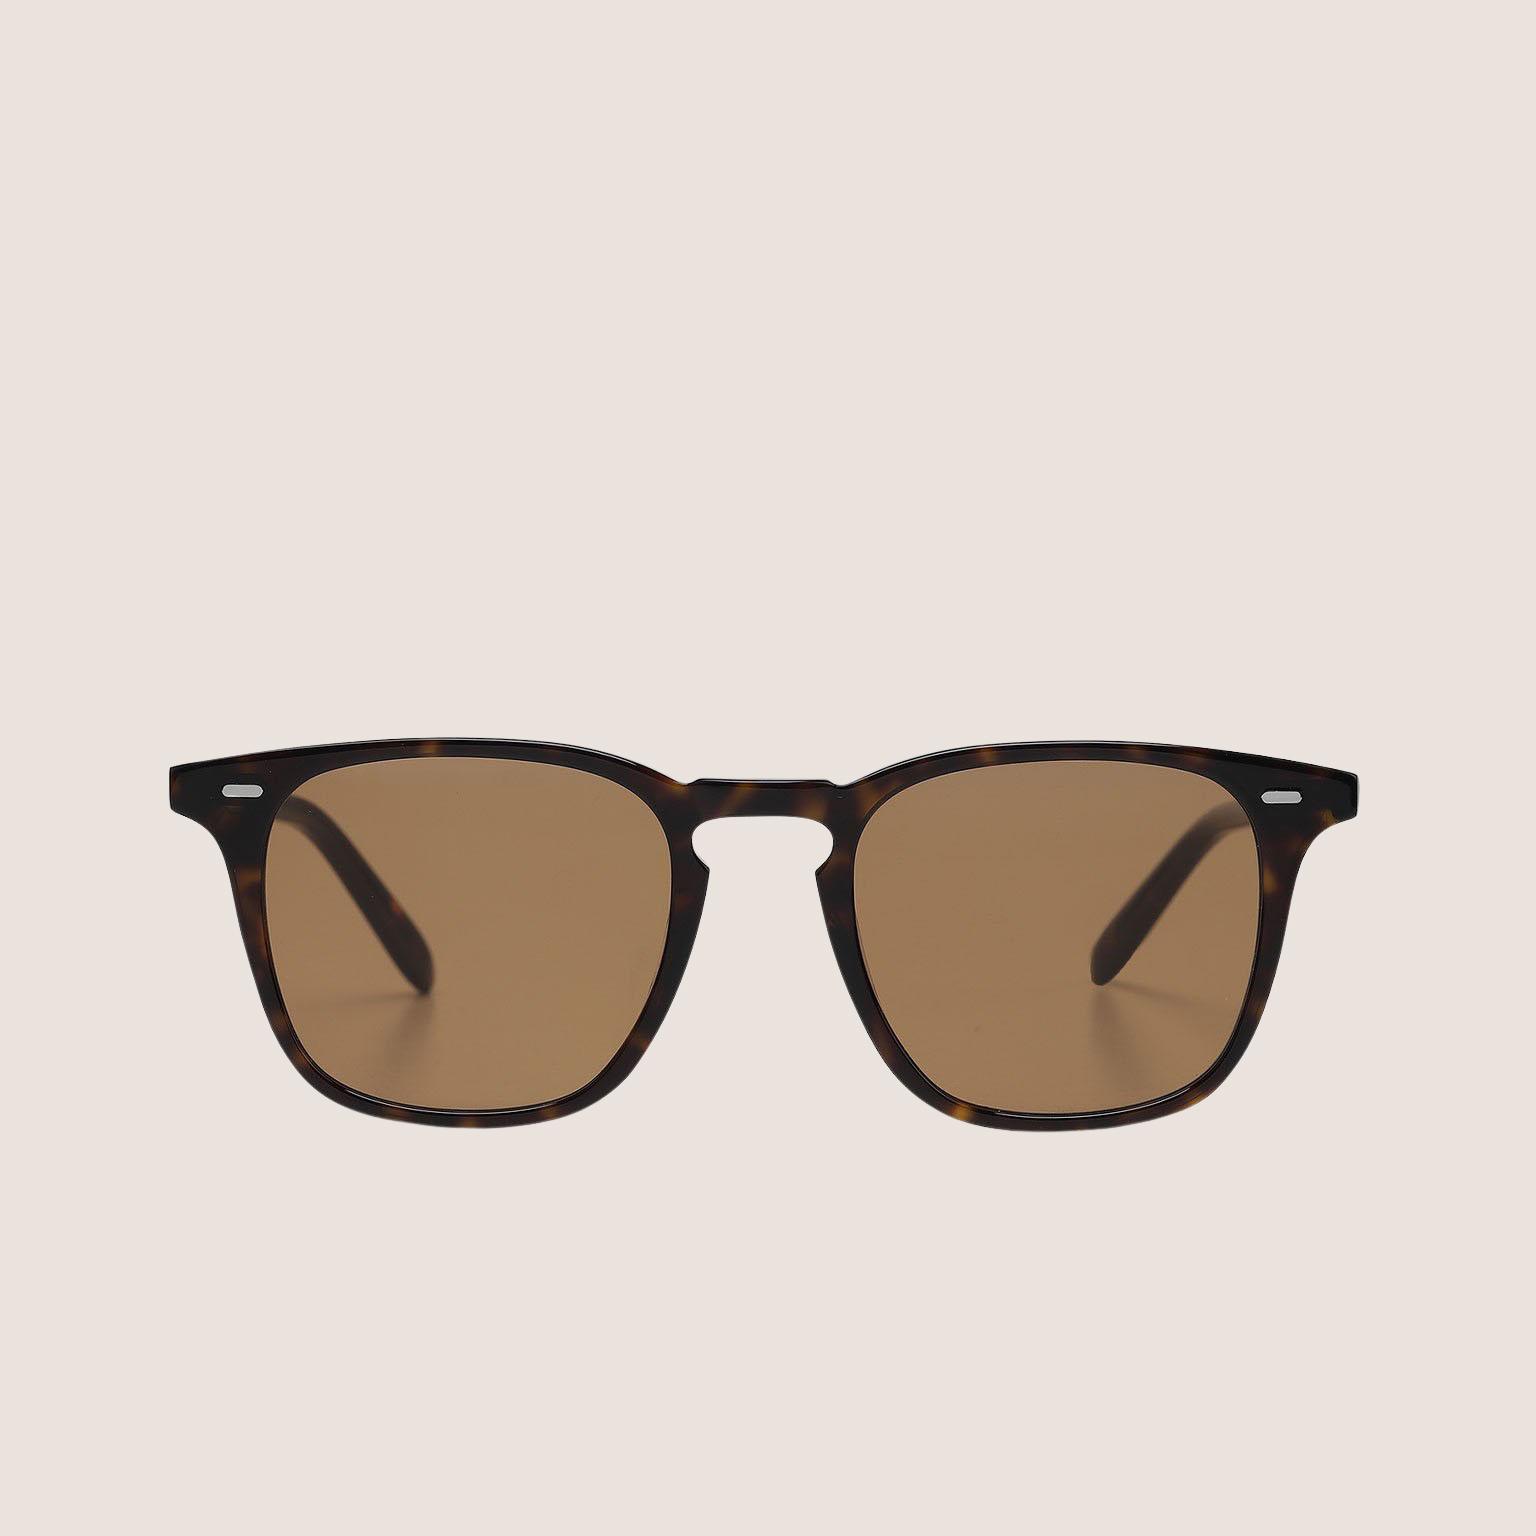 Faber Classic Sunglasses - Brown